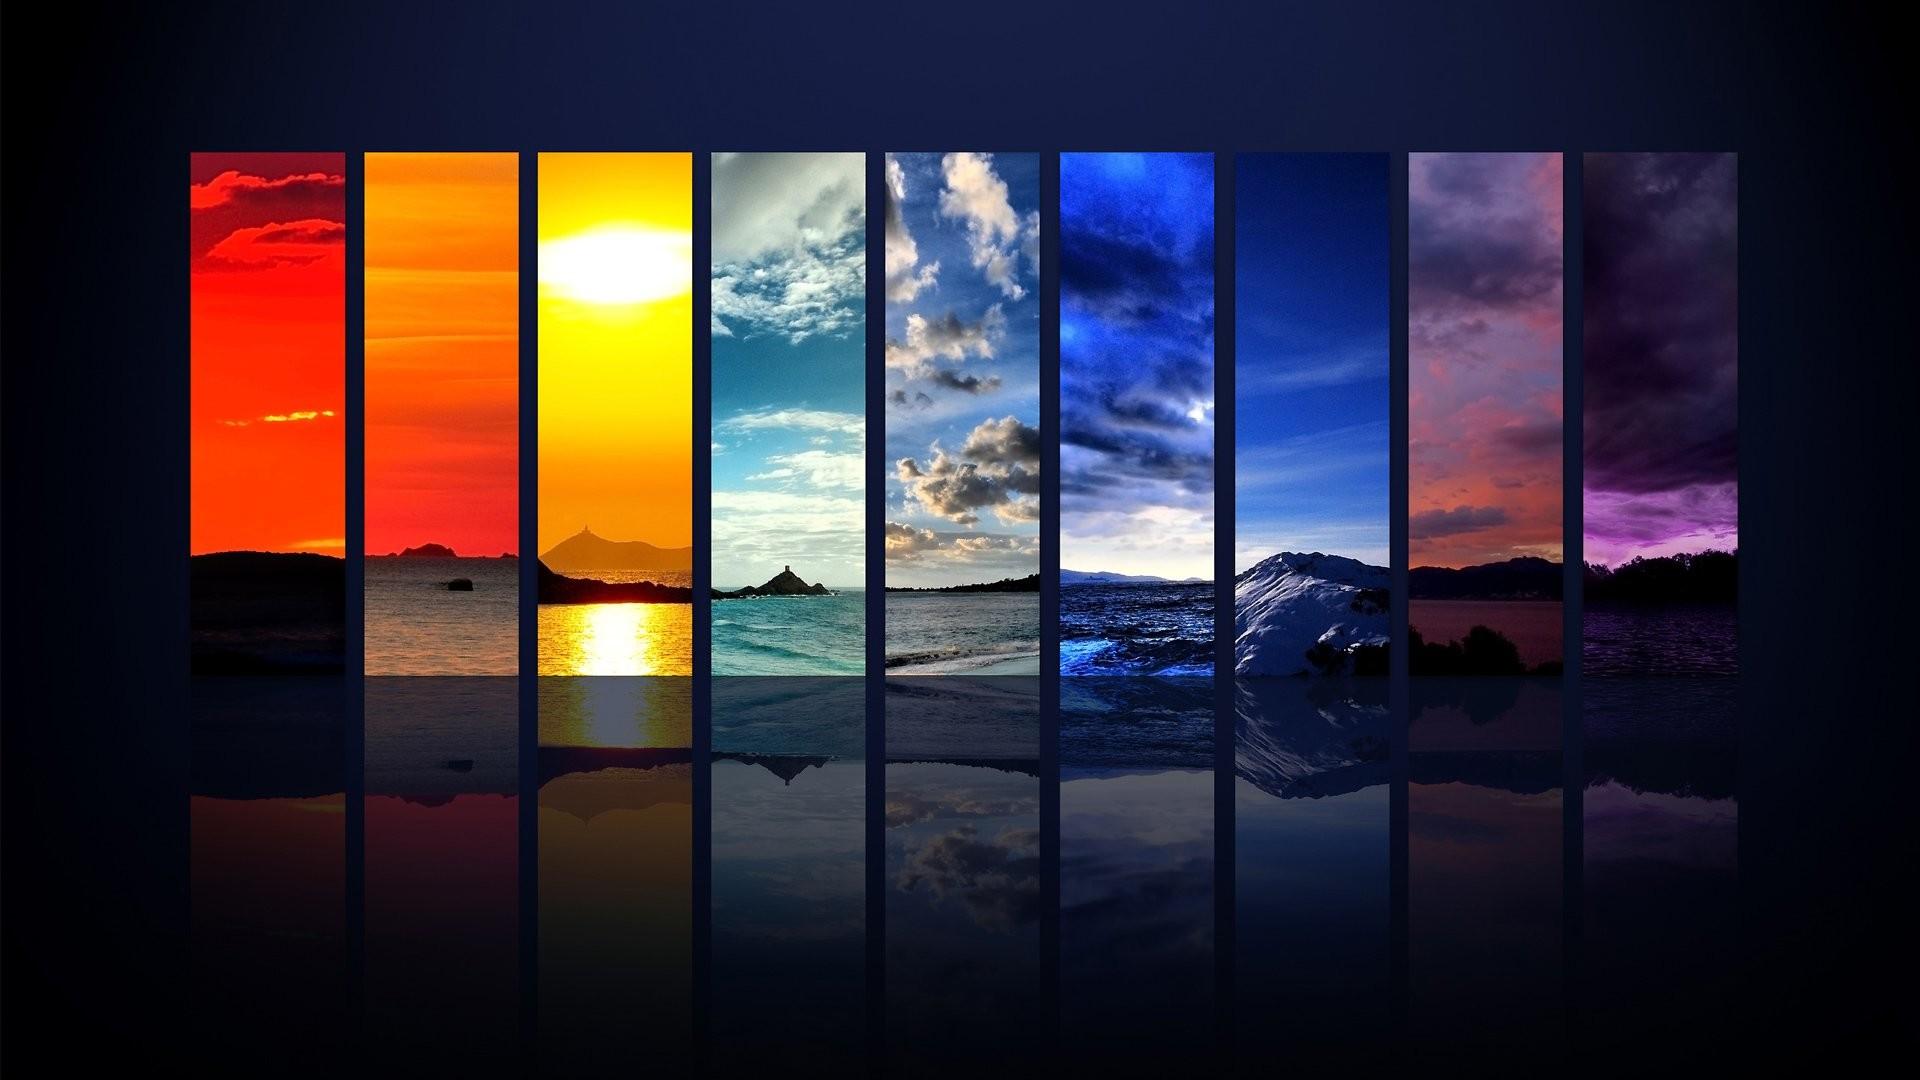 Dark Sky Abstract HD Wallpaper Download HD Wallpapers 1920×1080